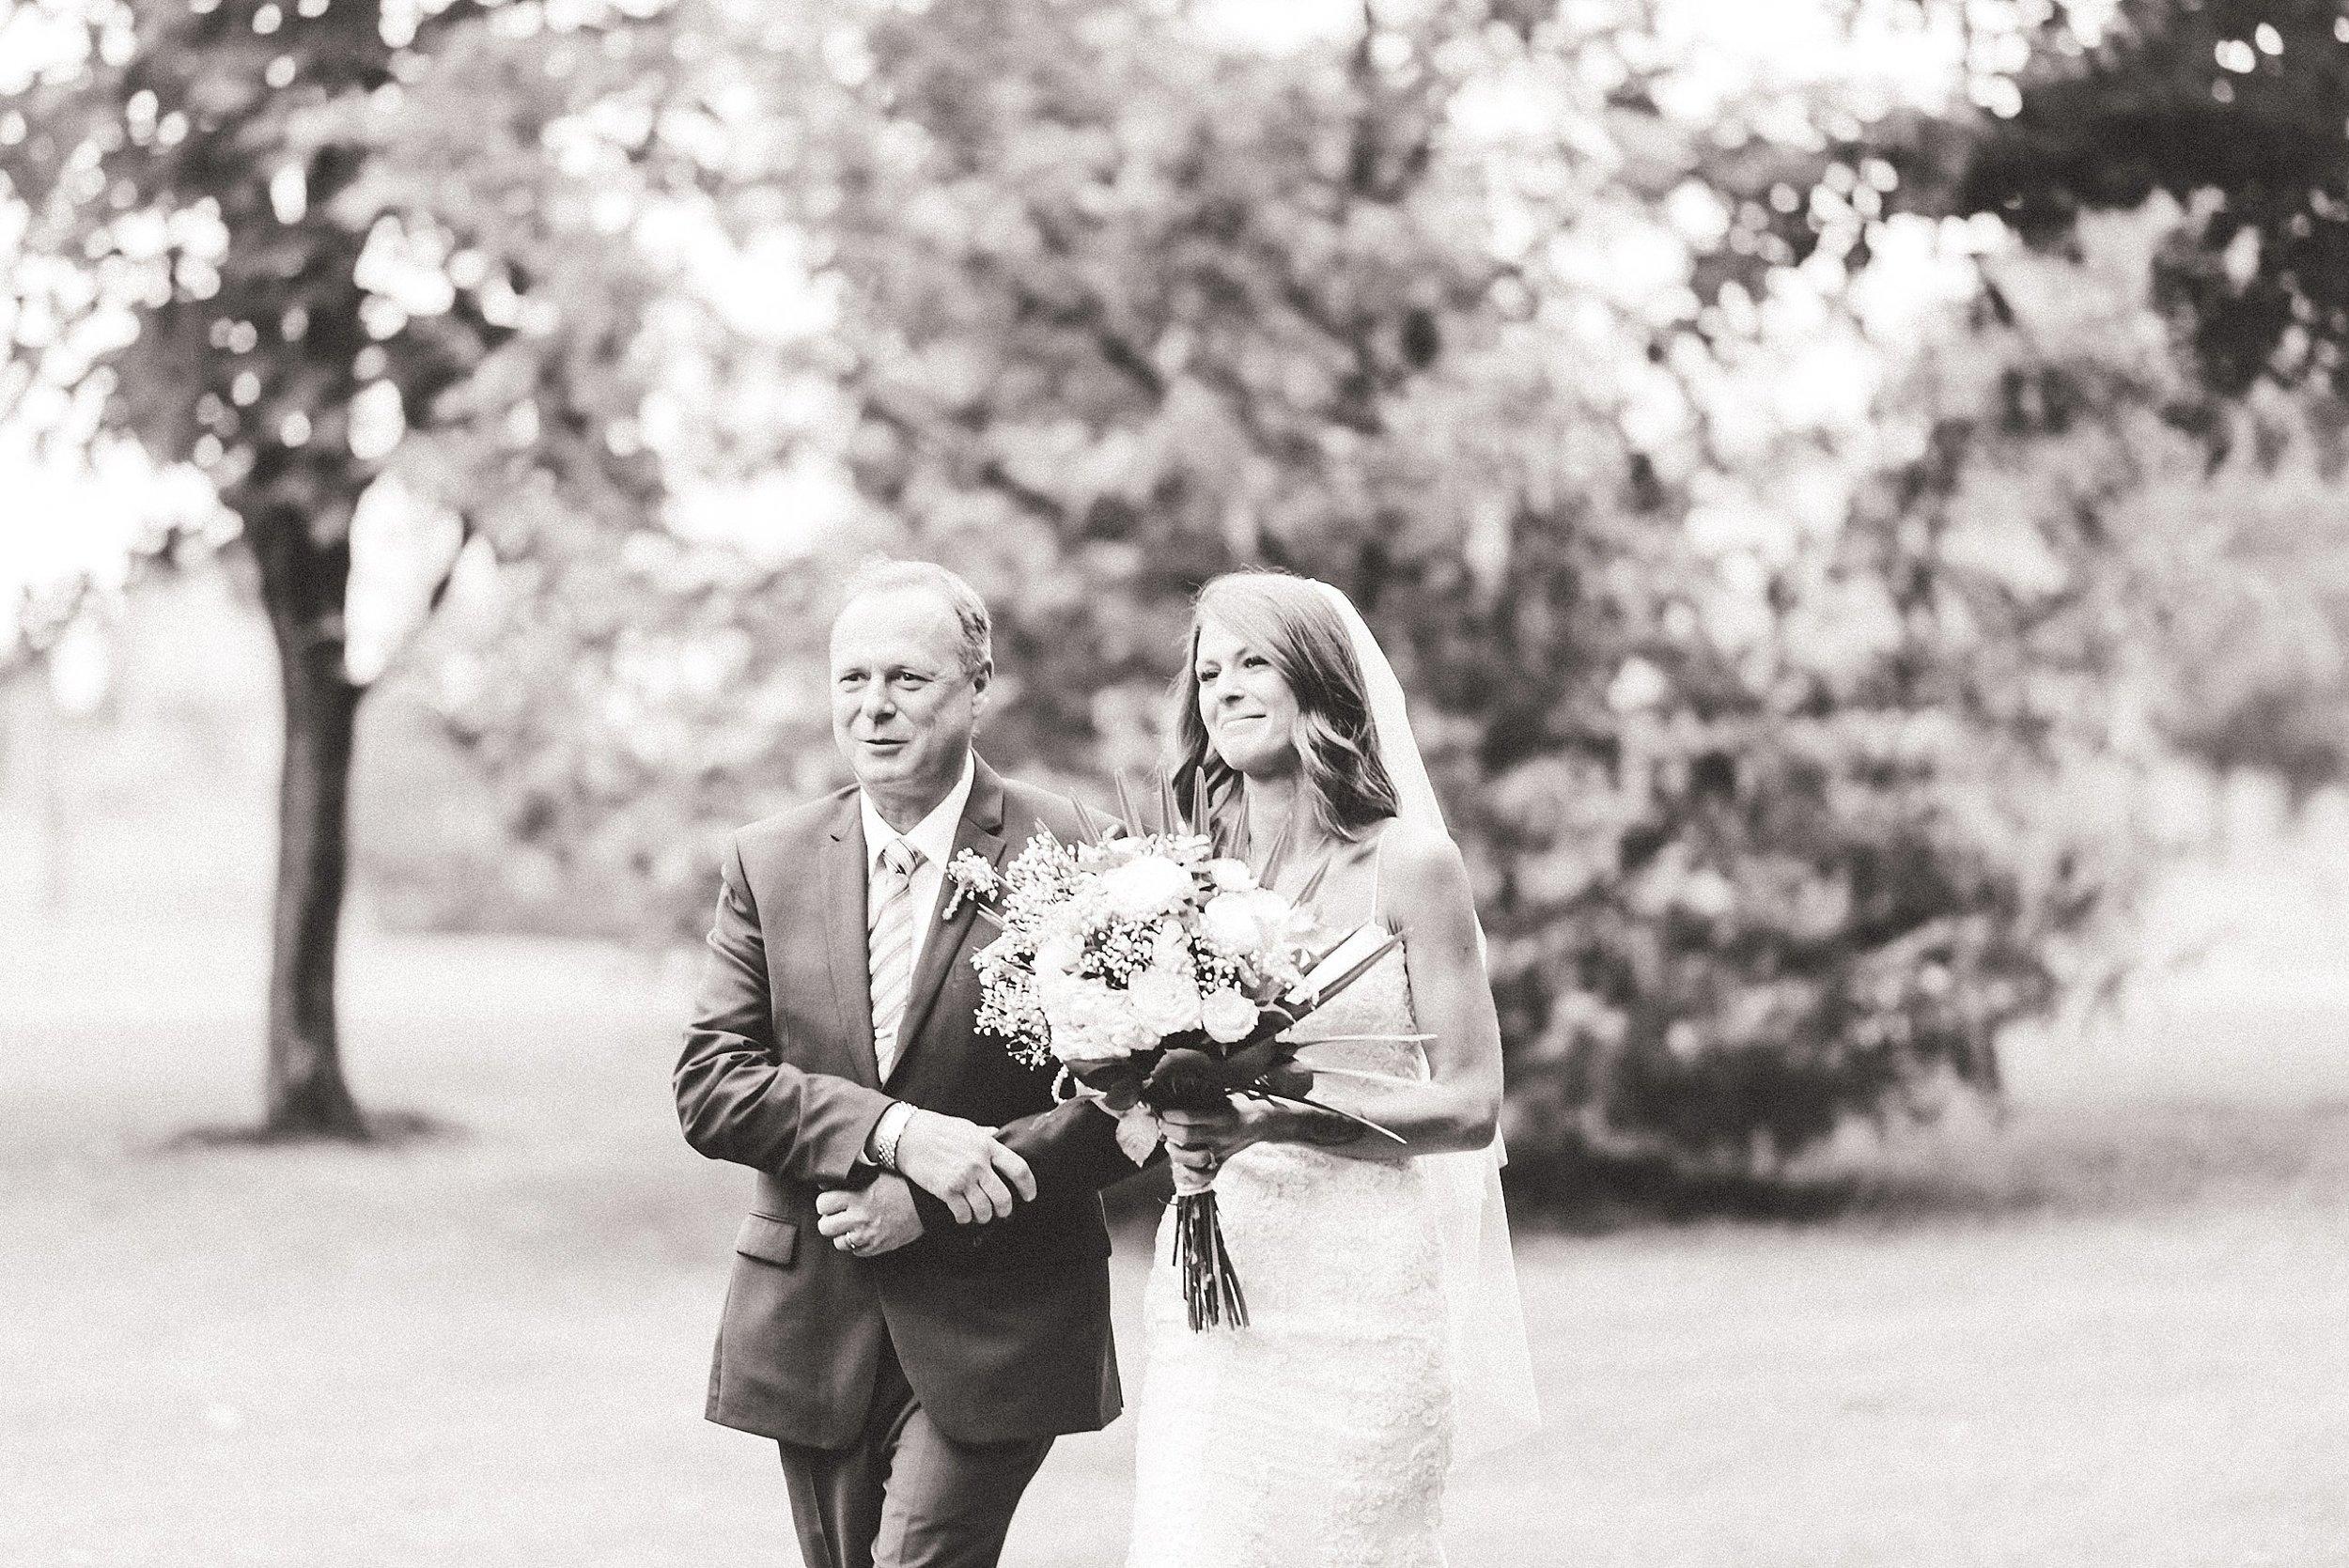 Ottawa Wedding Photographer - Stanley's Olde Maple Lane Barn Wedding - Ali & Batoul Photography_0026.jpg